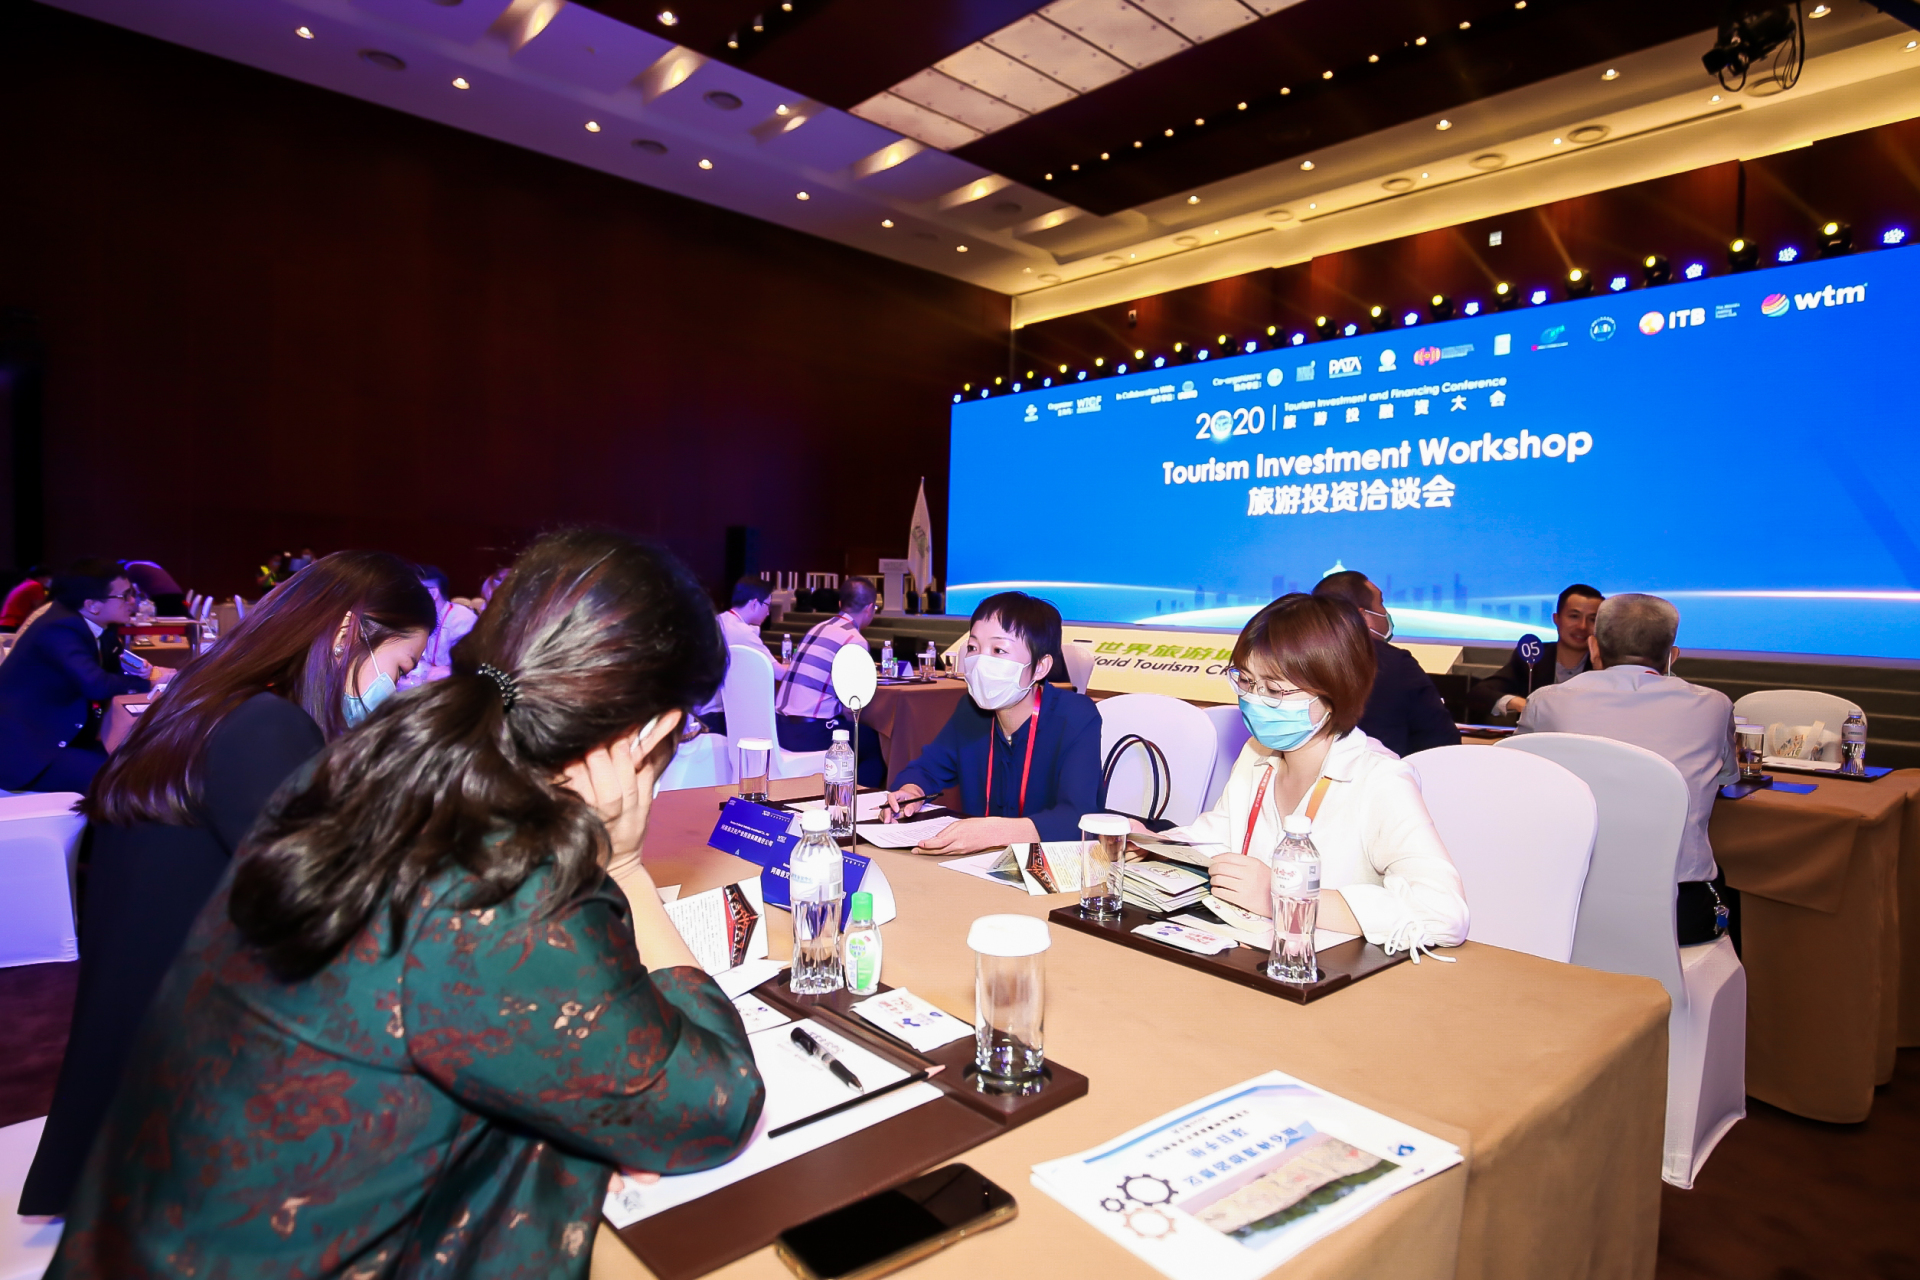 Tourism Investment Workshop